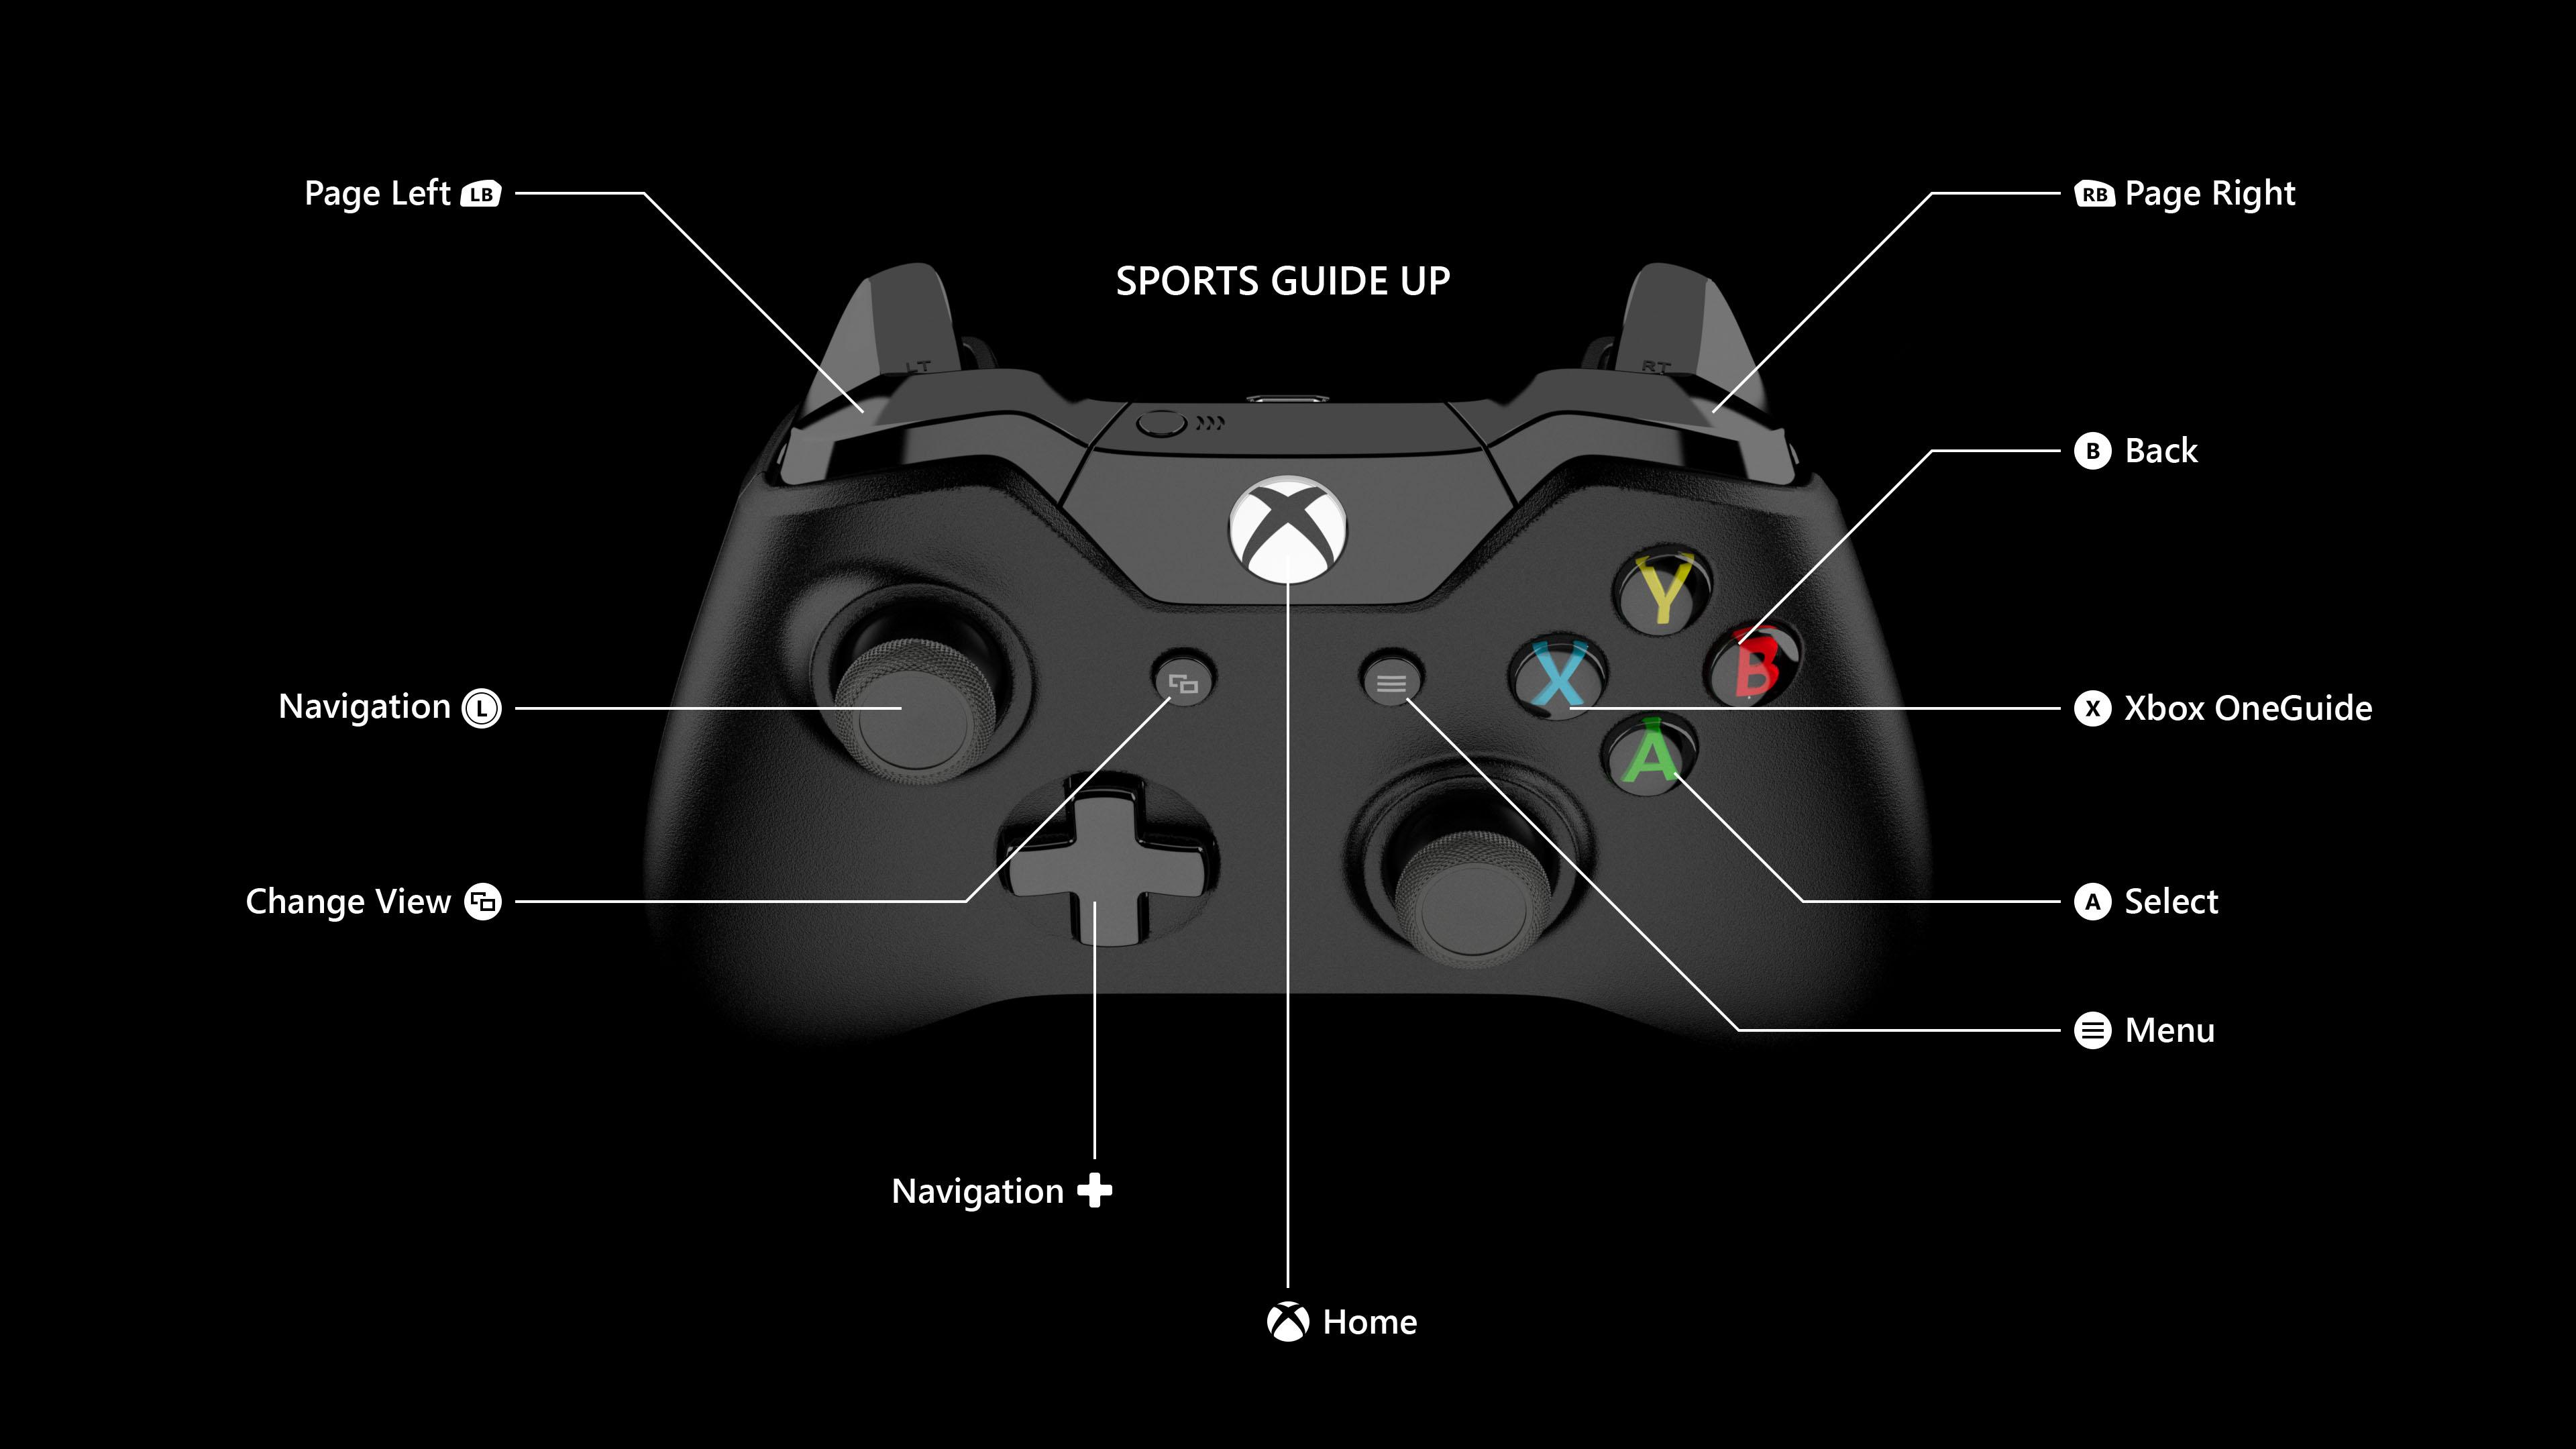 Nfl App Xbox One Remote Wiring Diagram